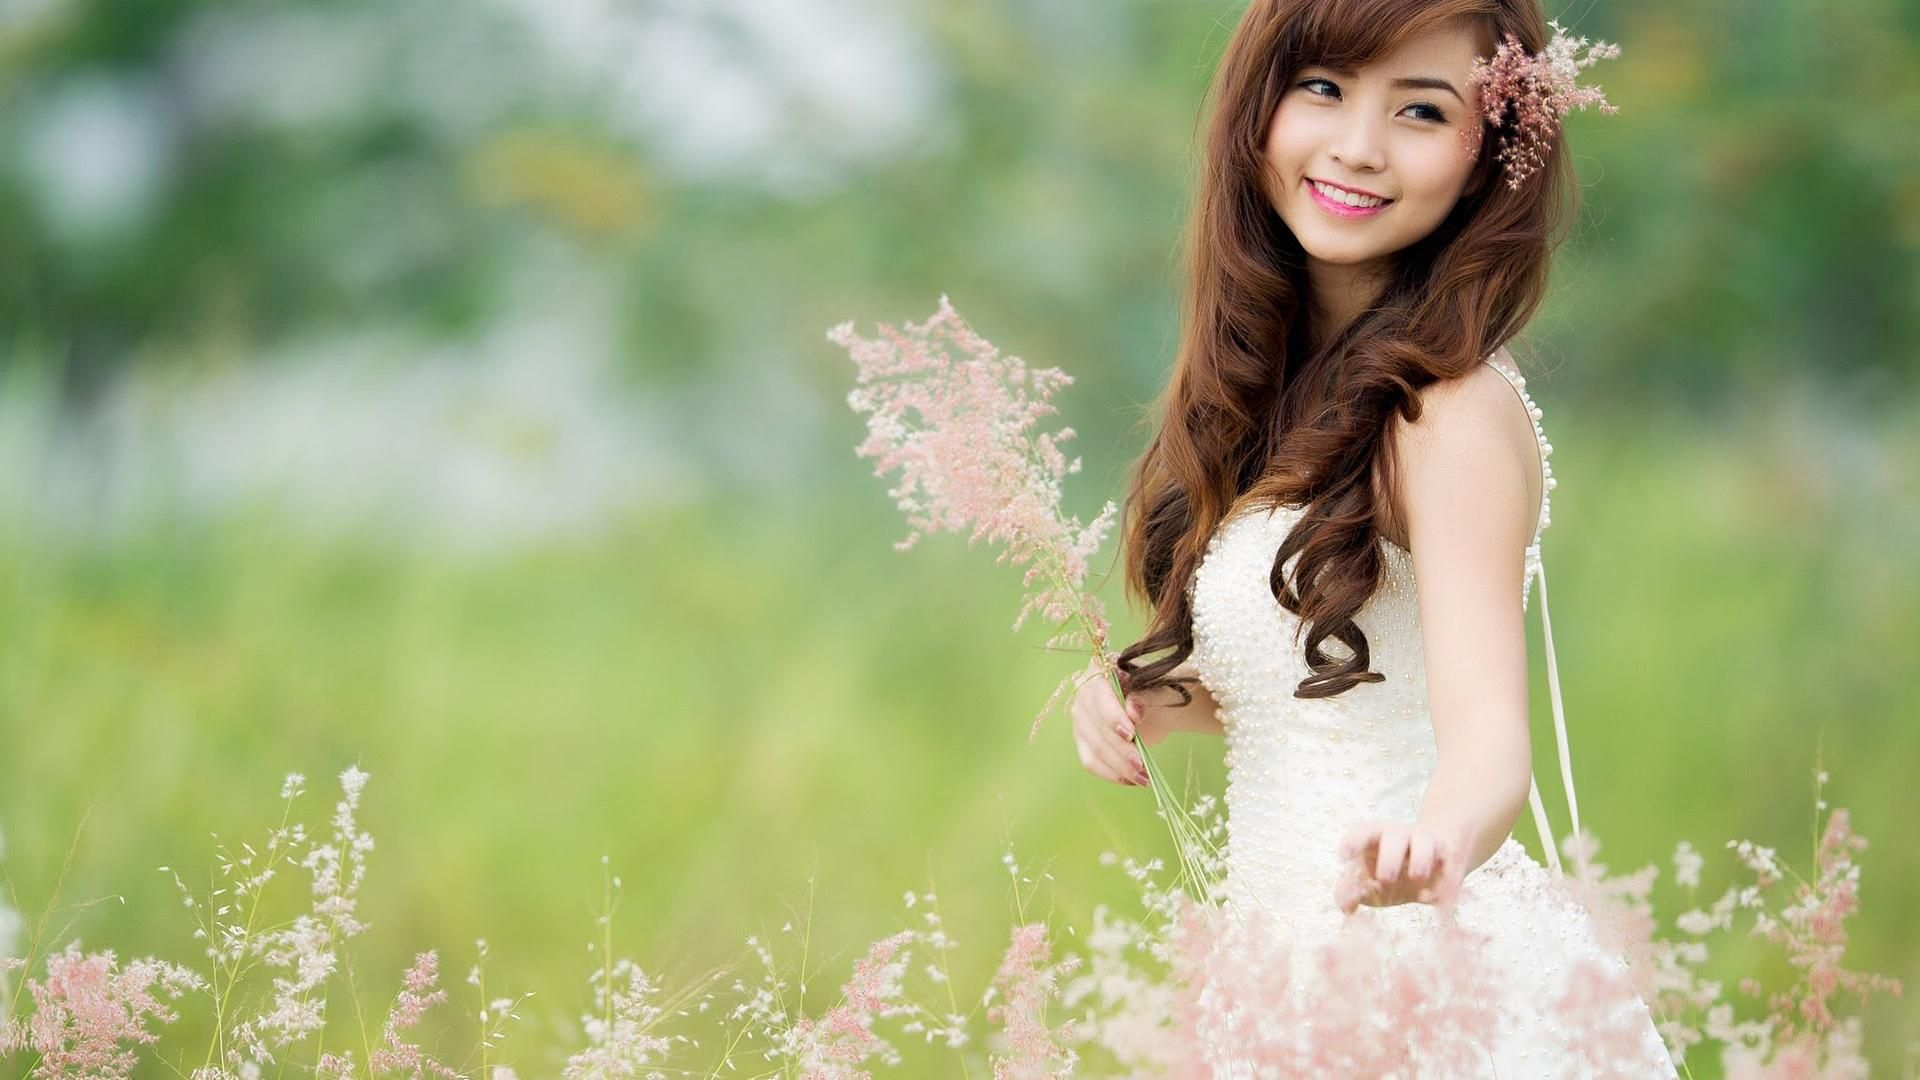 Hd wallpaper cute girl - Cute Girls Hd Images 4